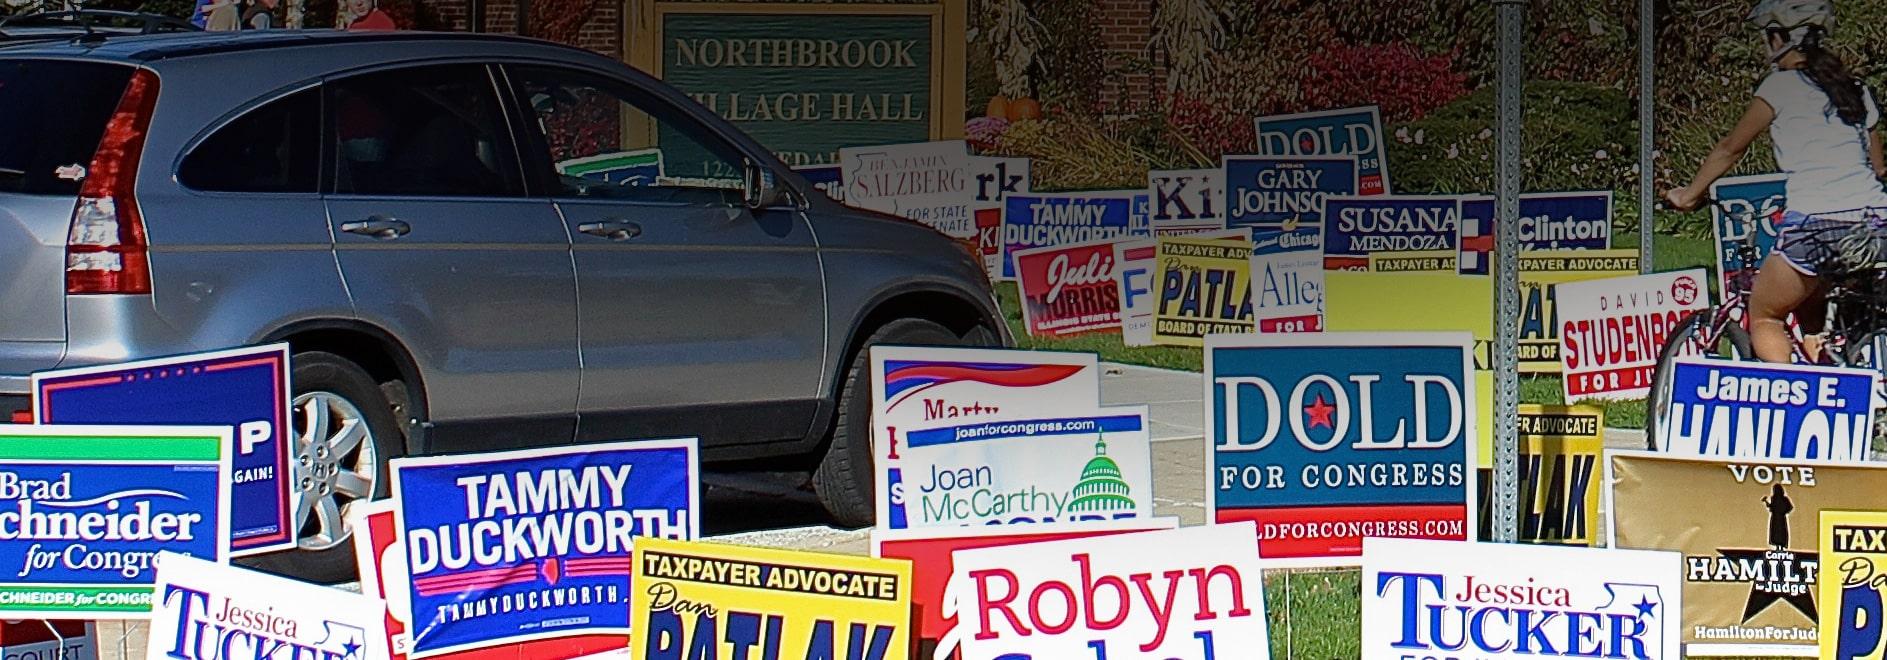 WEBSITE DESIGN POLITICAL CAMPAIGNS